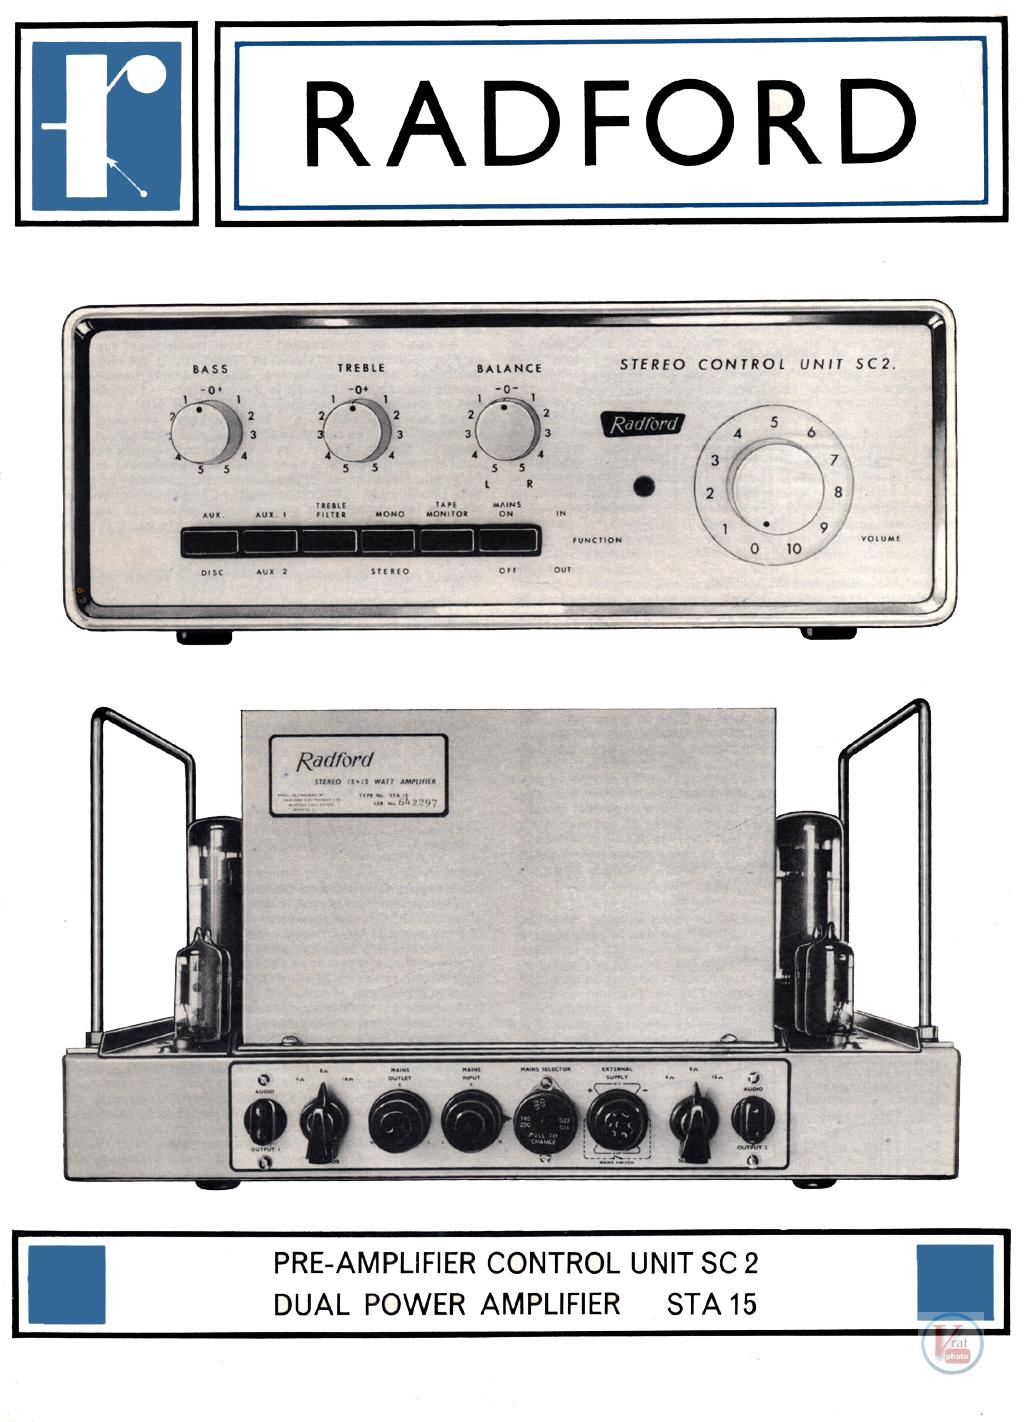 Radford Amplifiers 13